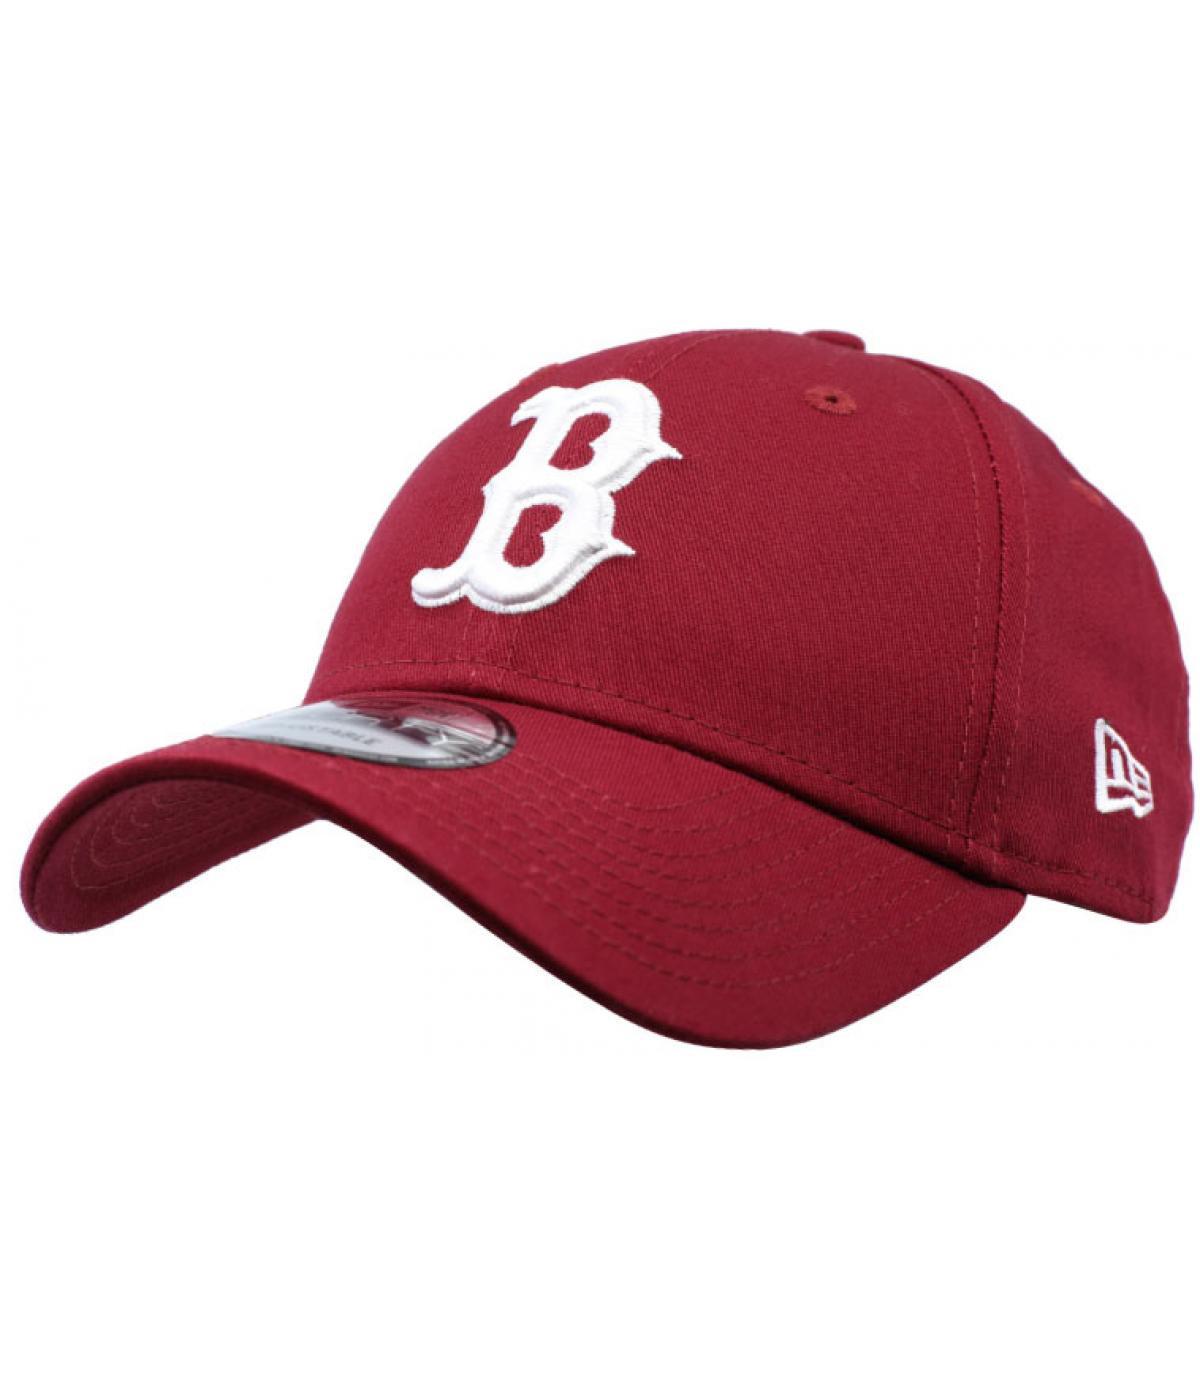 Details League Ess 9Forty Boston cardinal - afbeeling 2